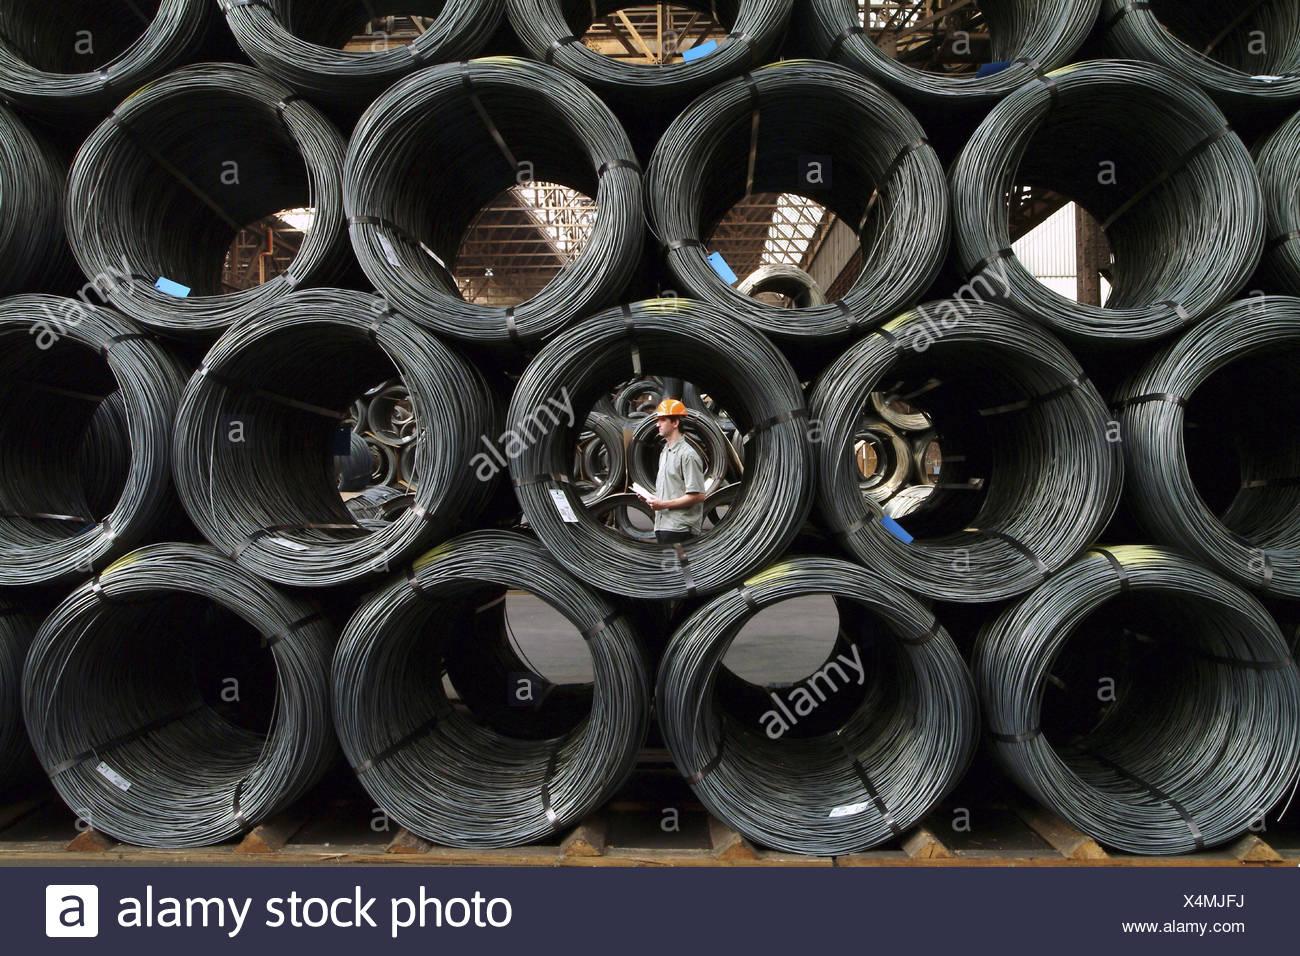 Germany, Saarbrucken-Burbach, Saarstahl Ag, wire warehouse, Europe, Saarland, industry, steel industry, ironworks, economy, branch industry, steel processing, production, production, wire, wire production, storage, rolling, wire coils - Stock Image